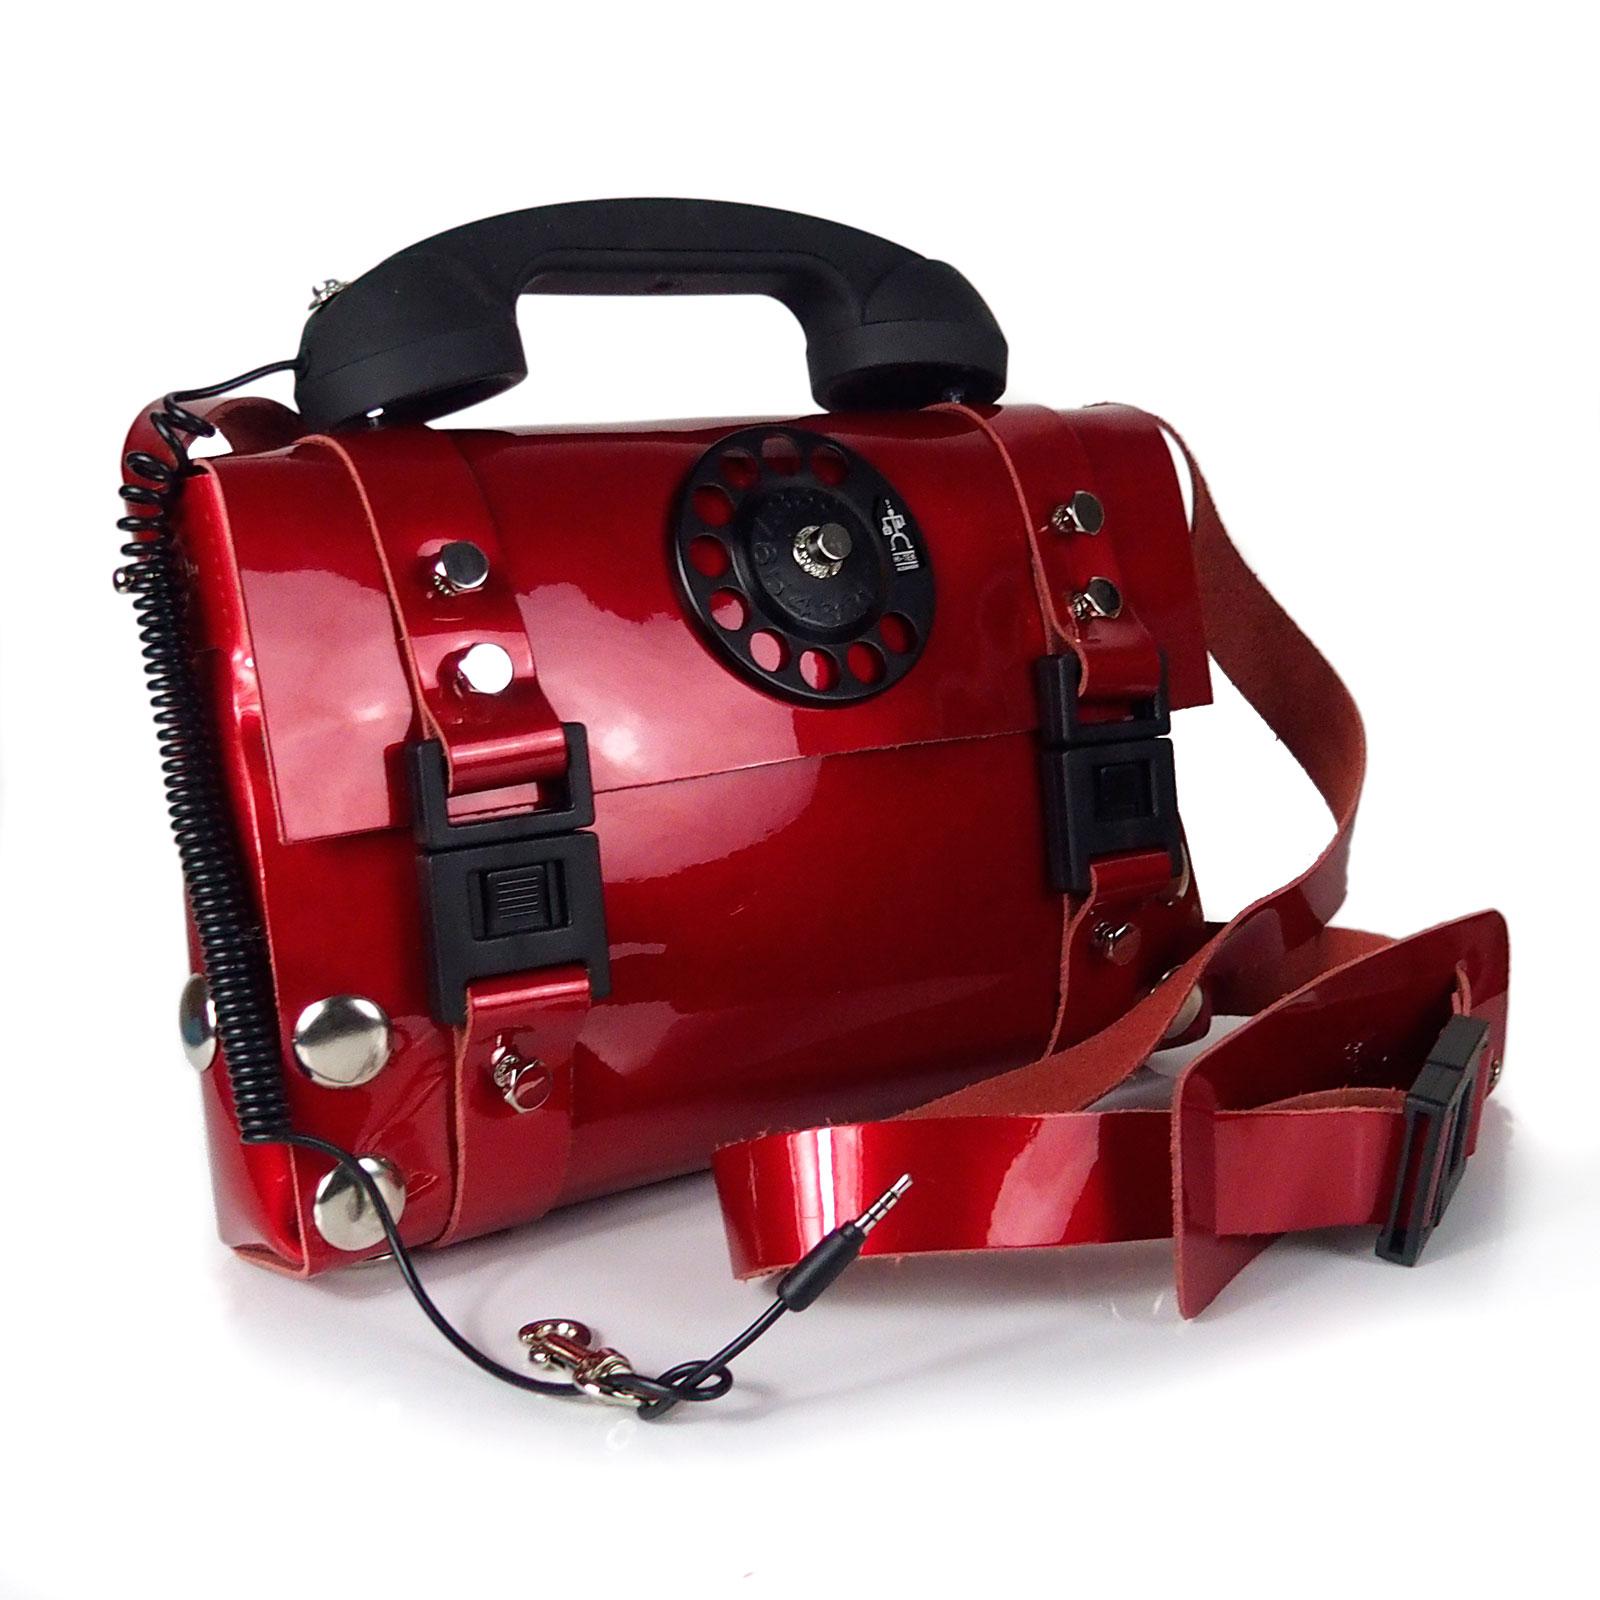 red shiny leather shoulder bag handbag with retro handle unusual statement bag